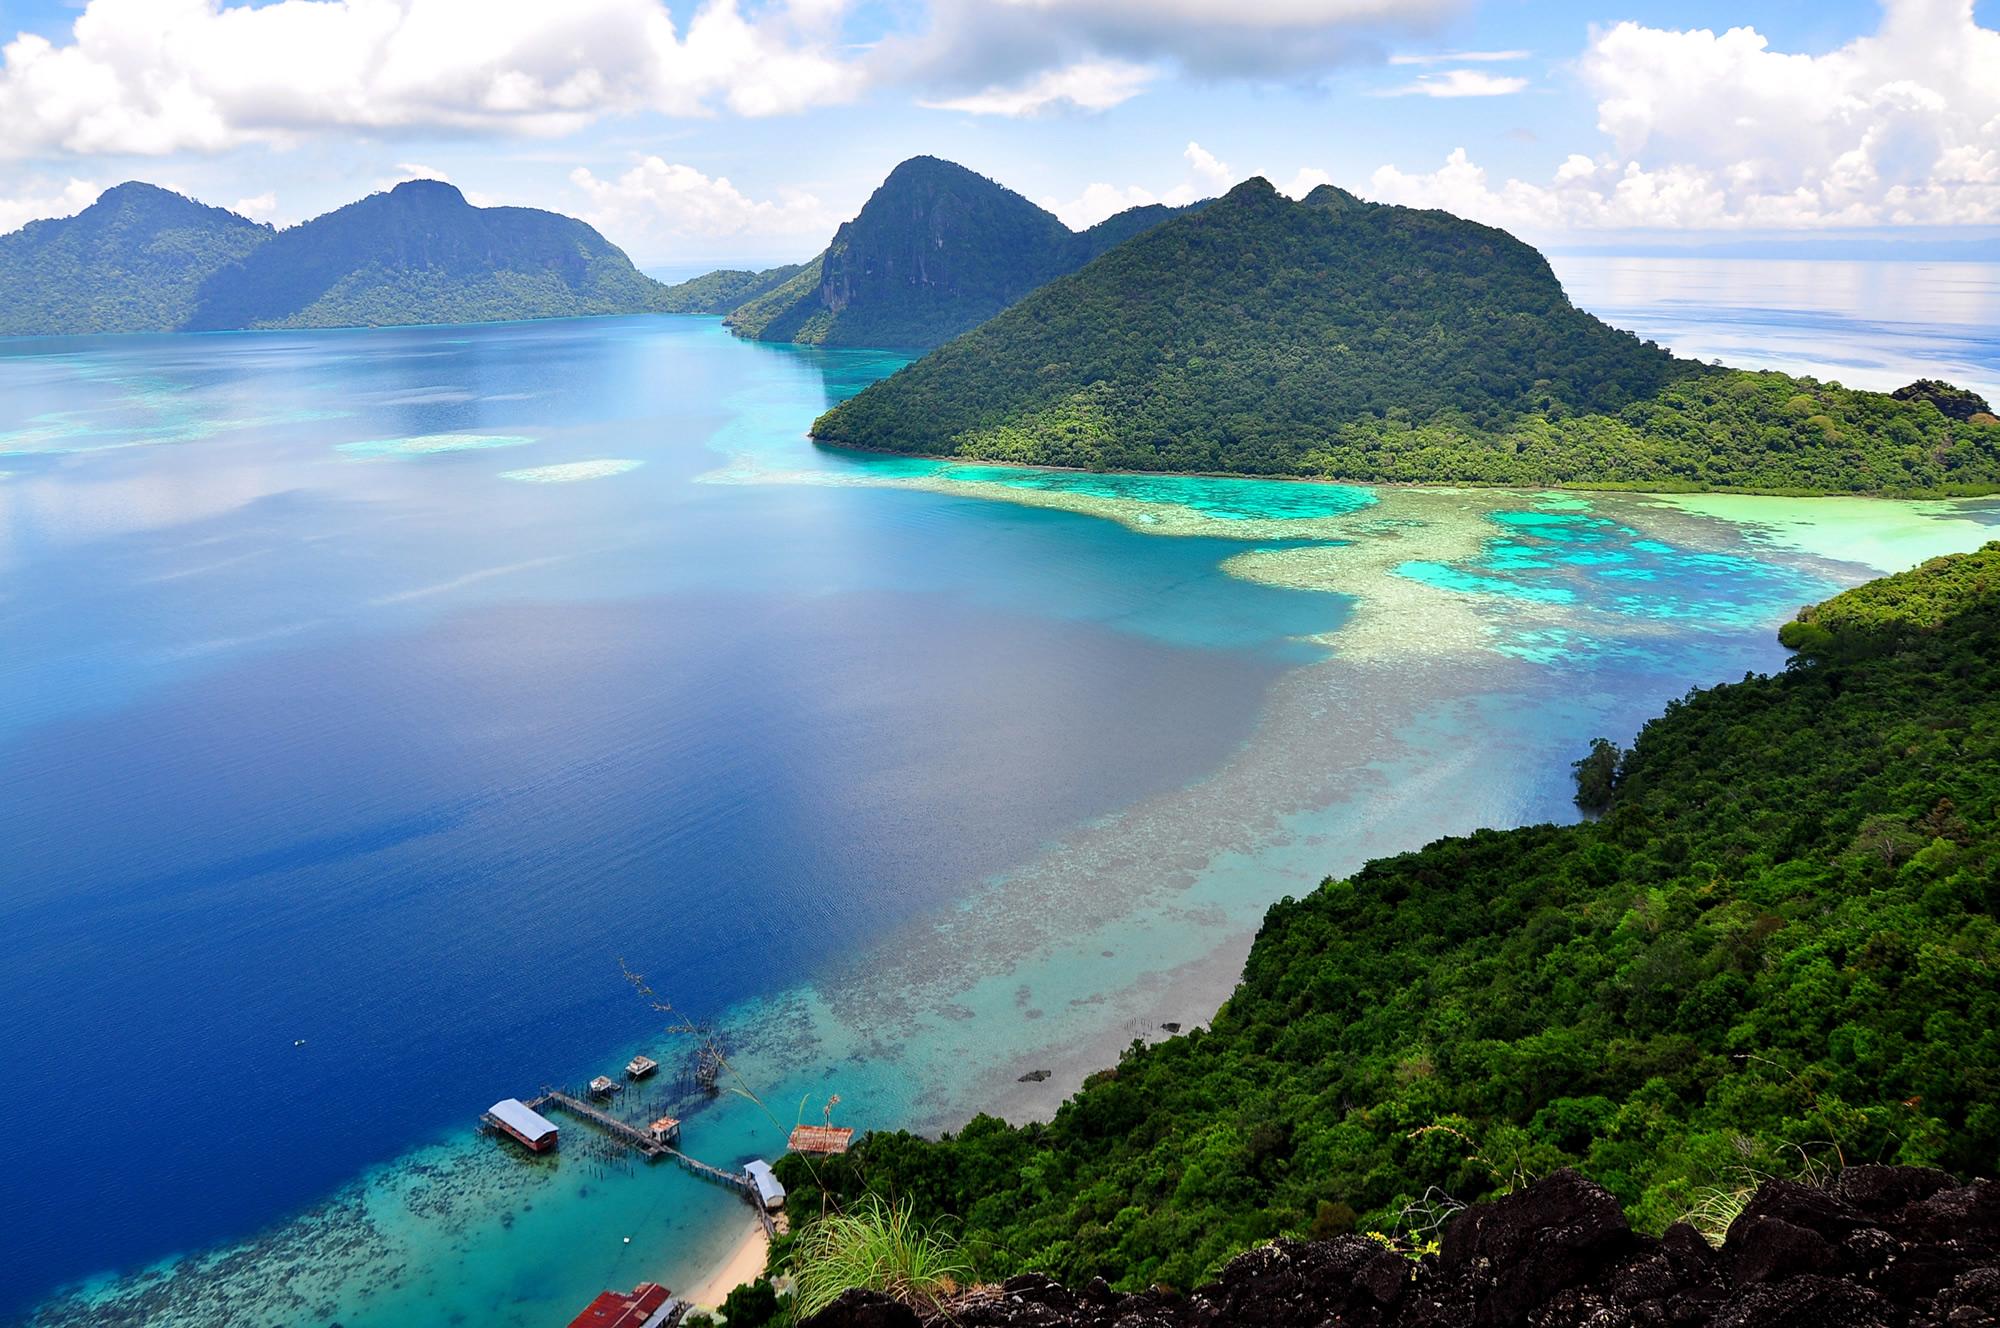 Malaysia Touristic Destination